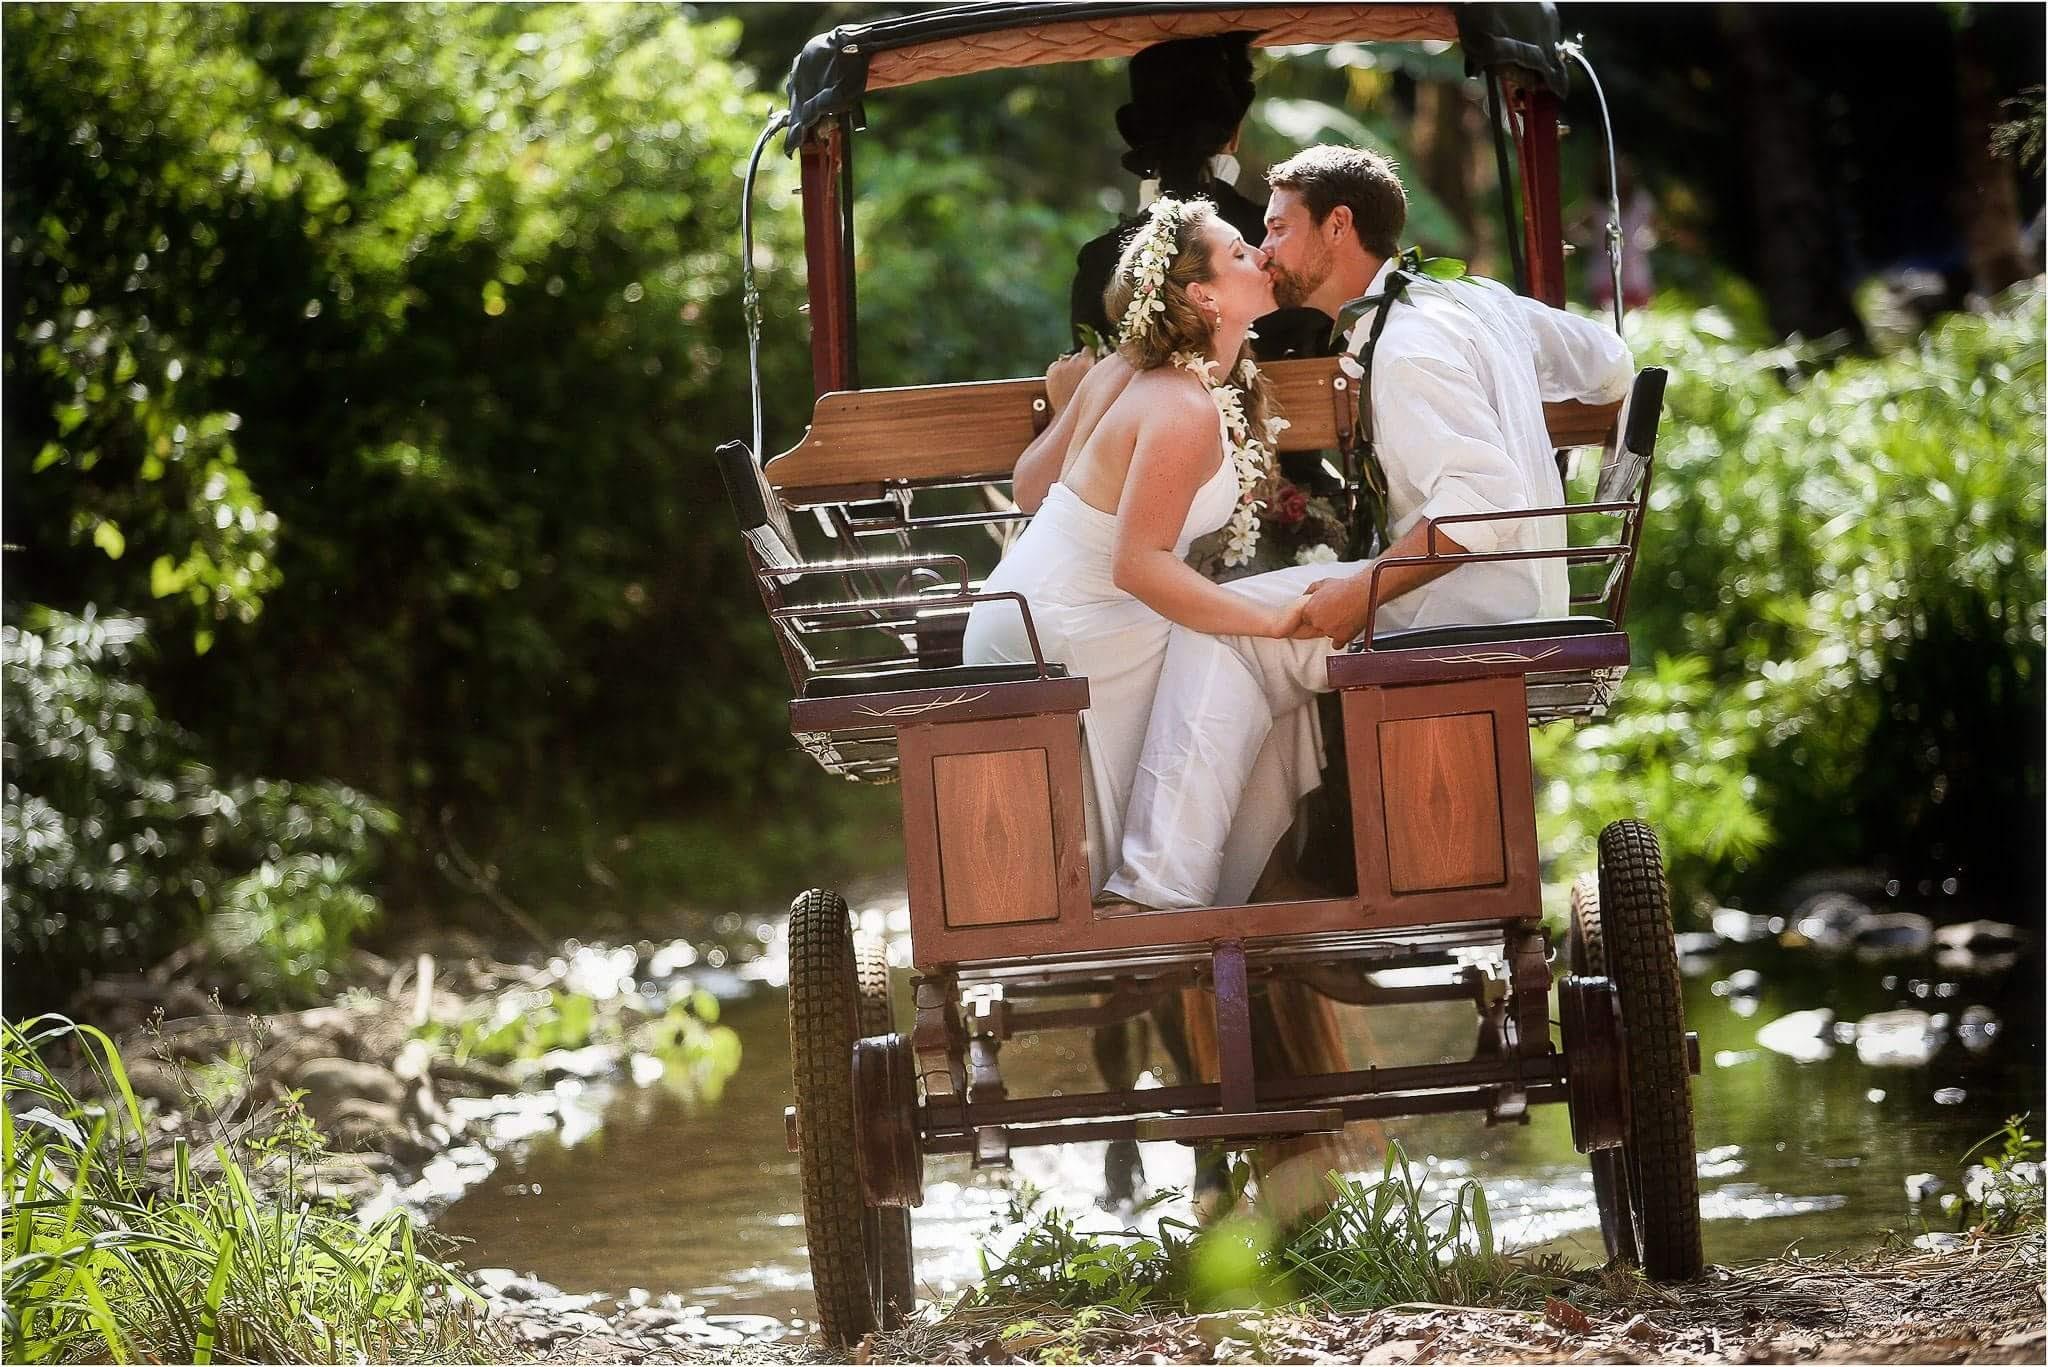 Old fashioned romance -